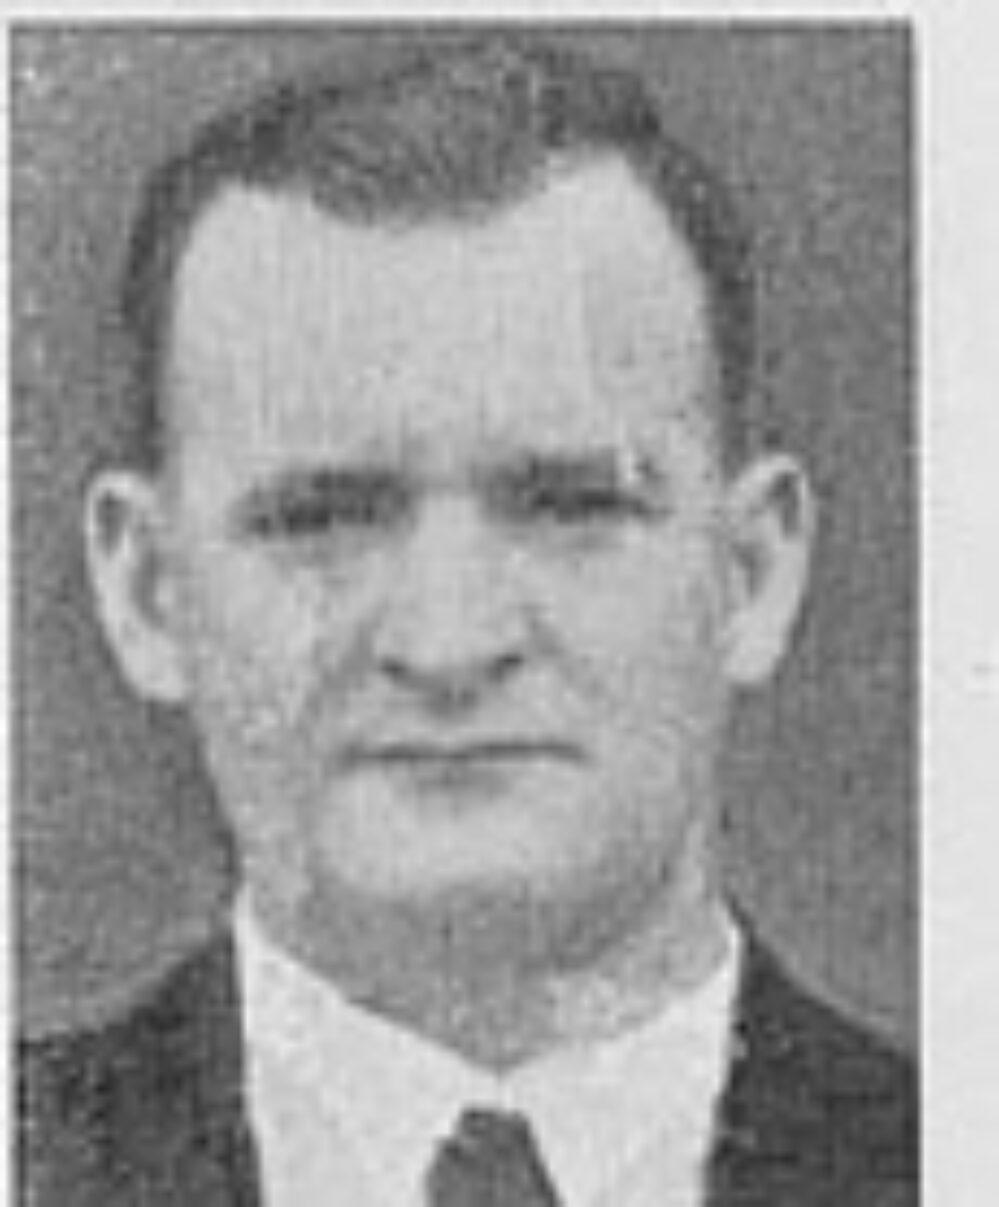 Olaf Jacobsen